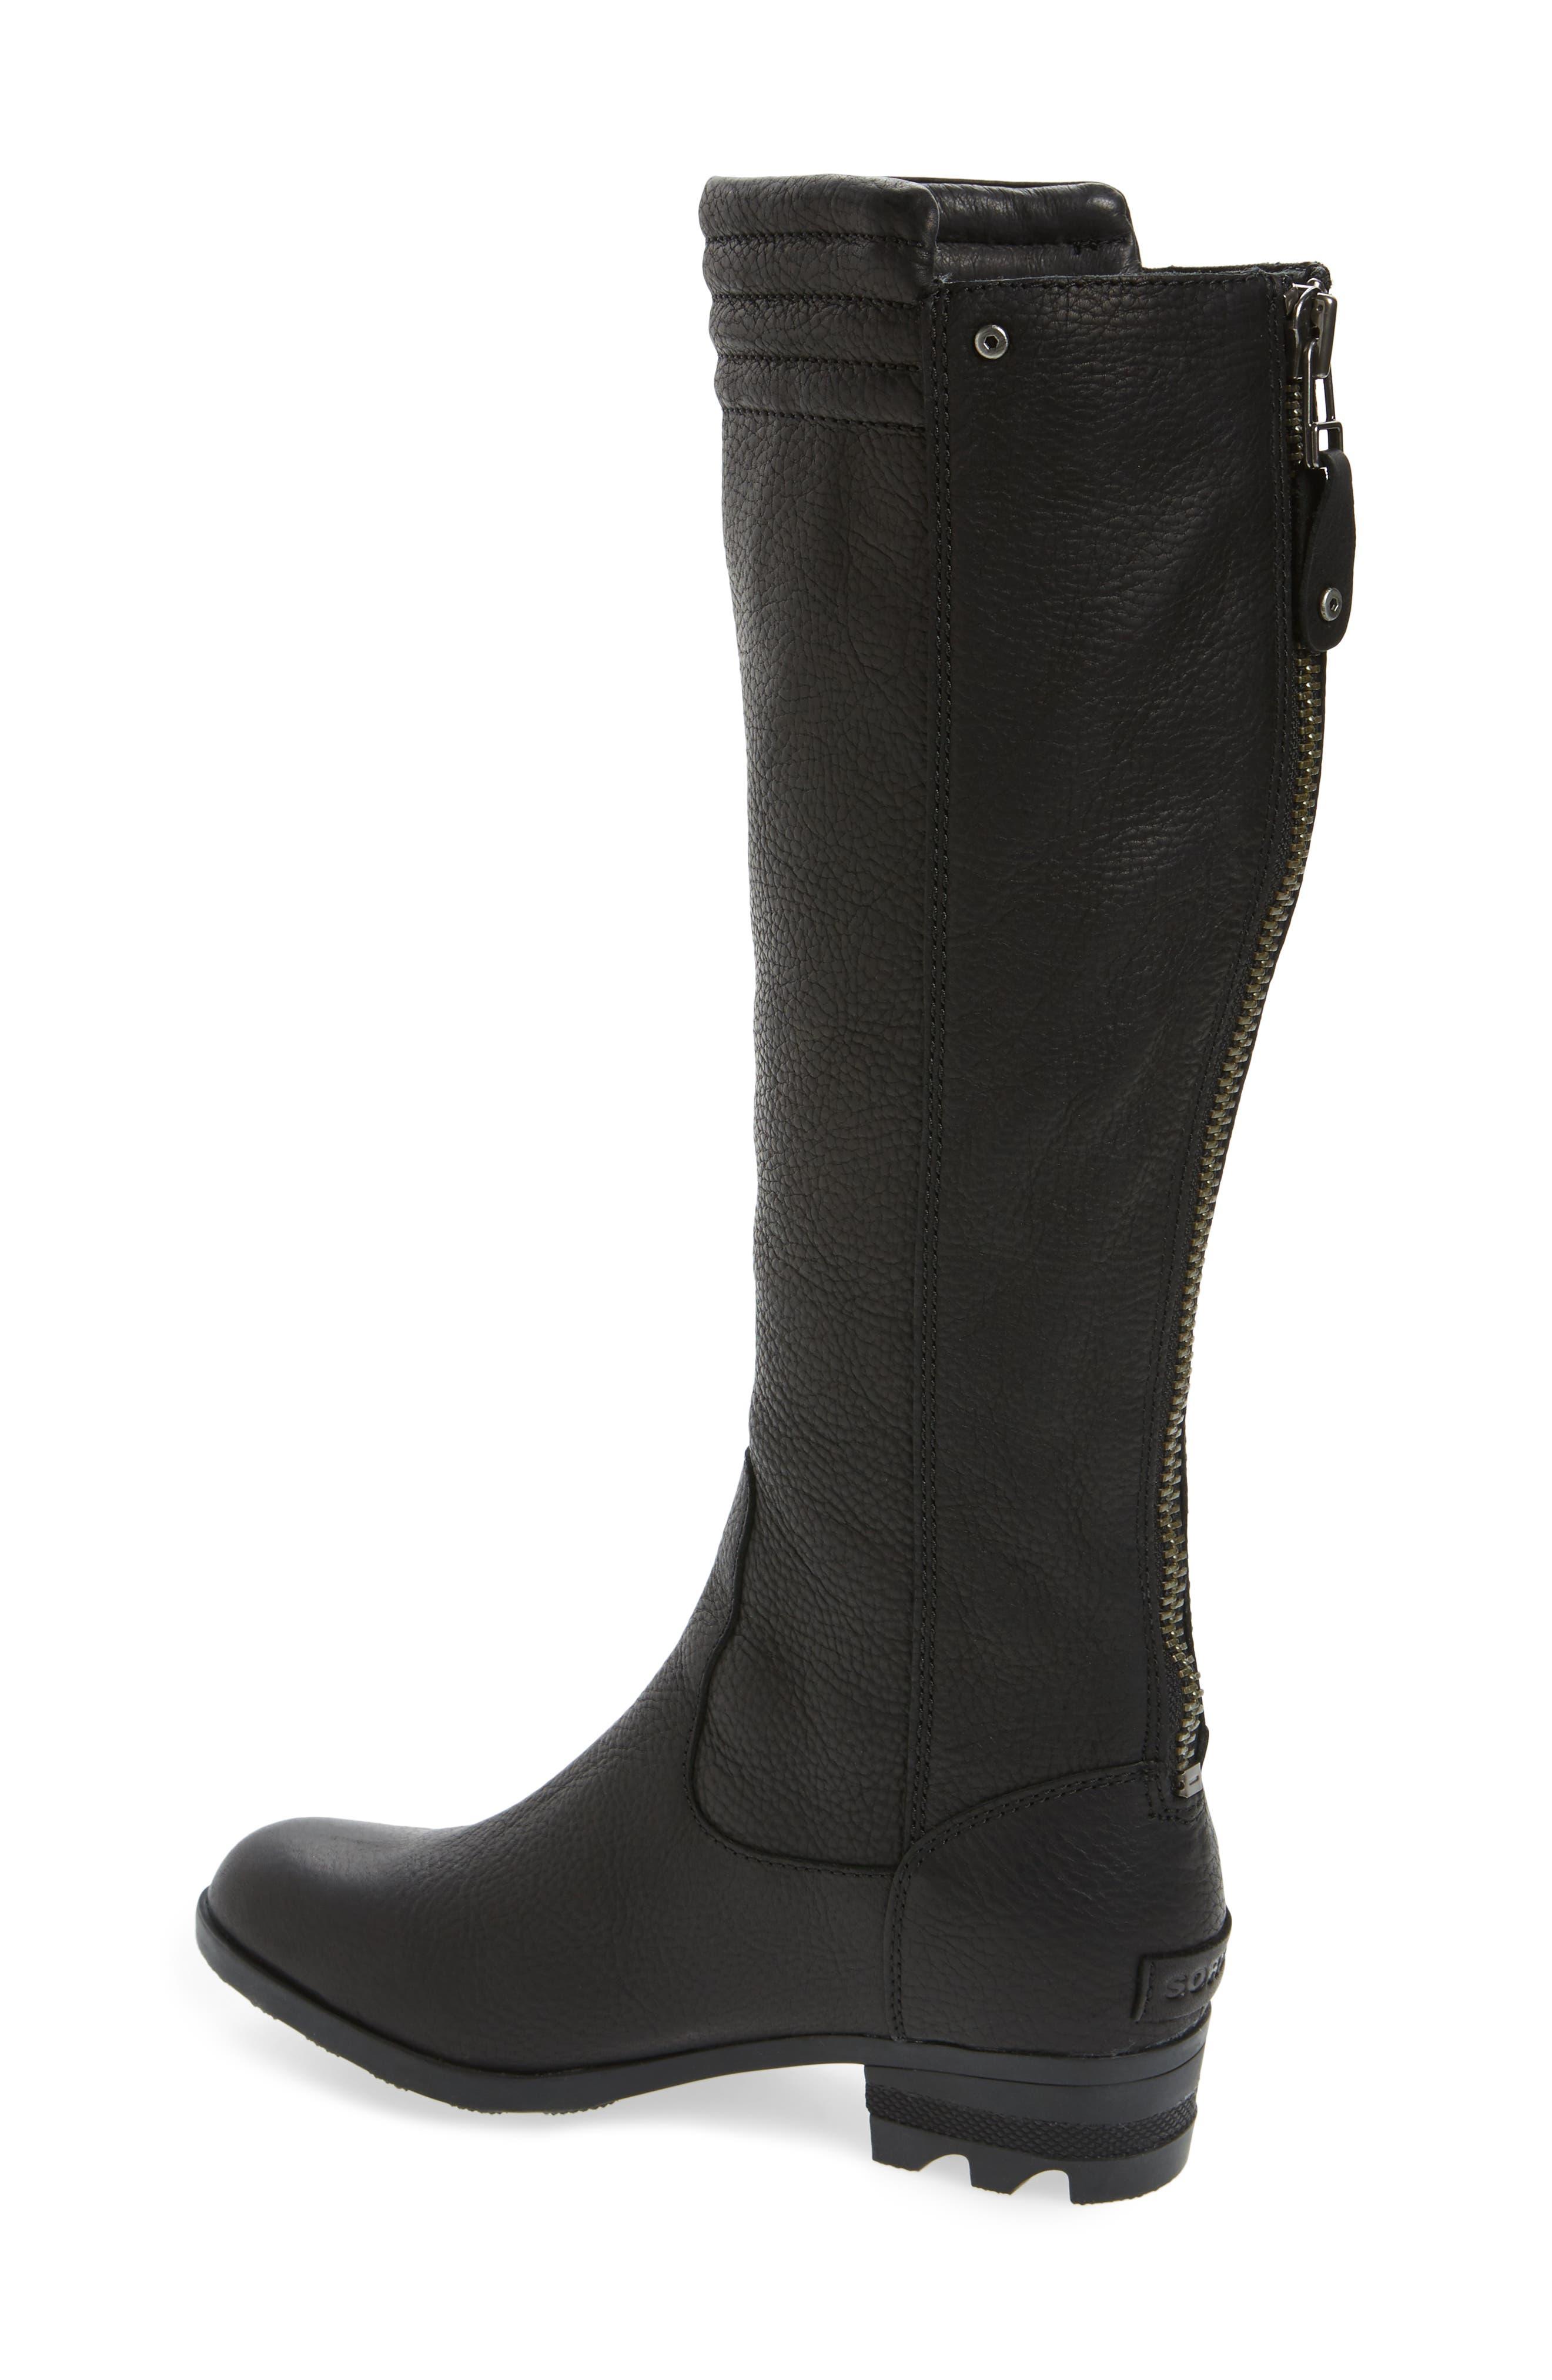 Danica Waterproof Knee High Boot,                             Alternate thumbnail 2, color,                             010